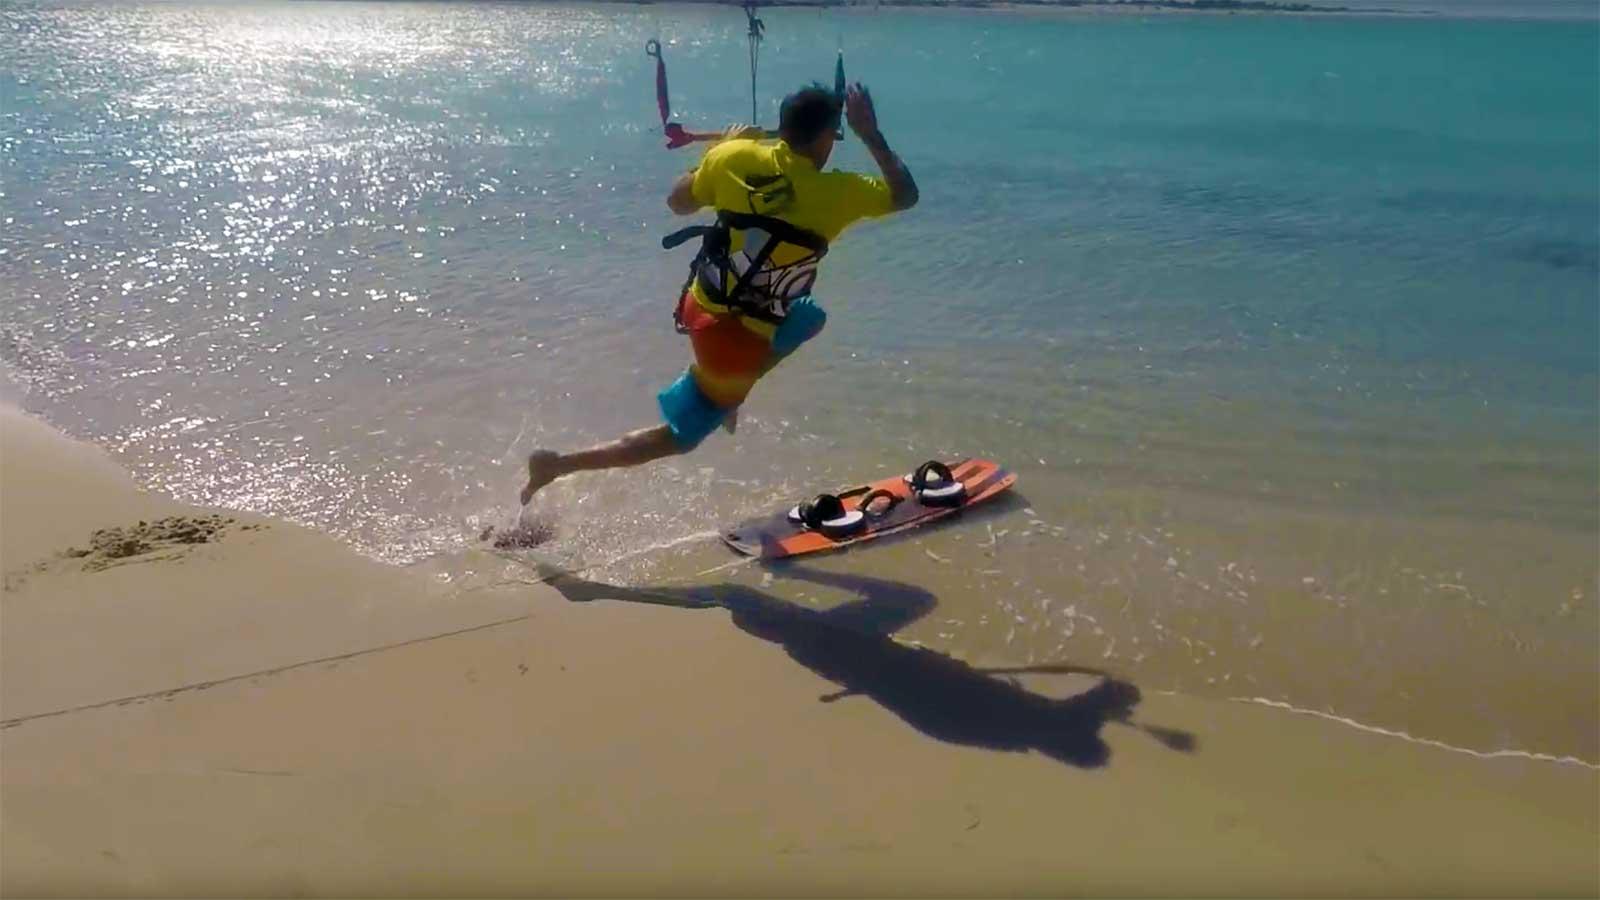 scuola kite surf italia